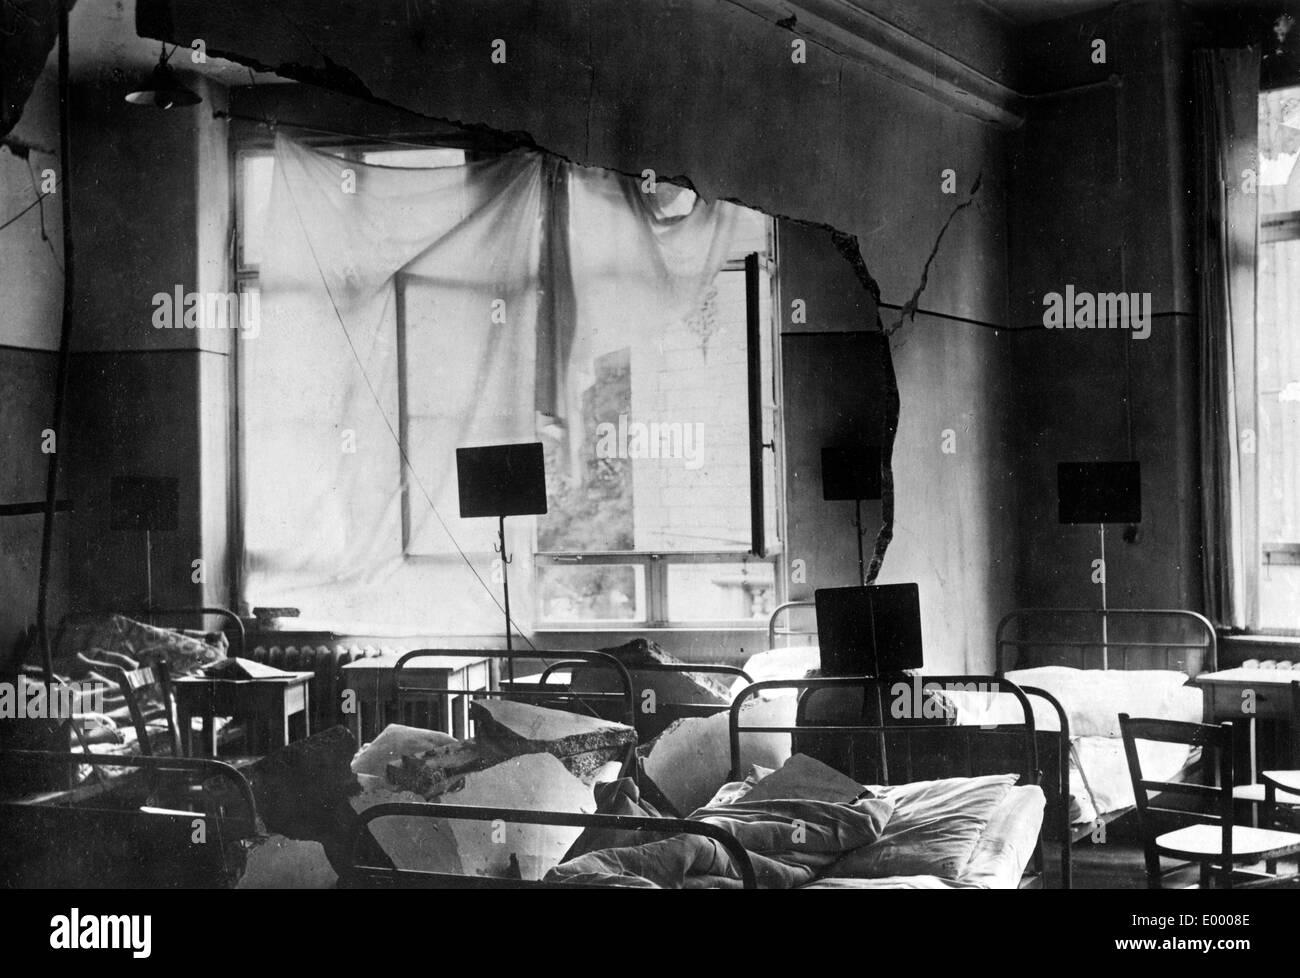 Demolished medical hospital, 1917 - Stock Image